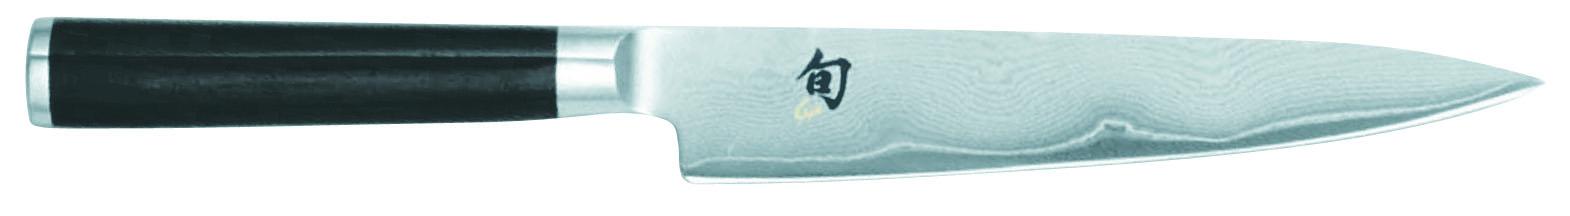 Kai Shun Classic DM-0701 Universalkniv 15 cm